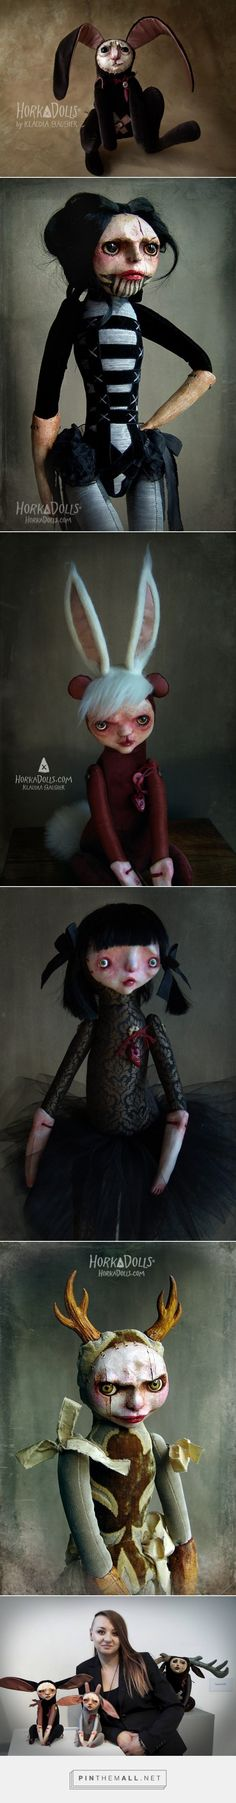 HORKA DOLLS - Art dolls sculptures